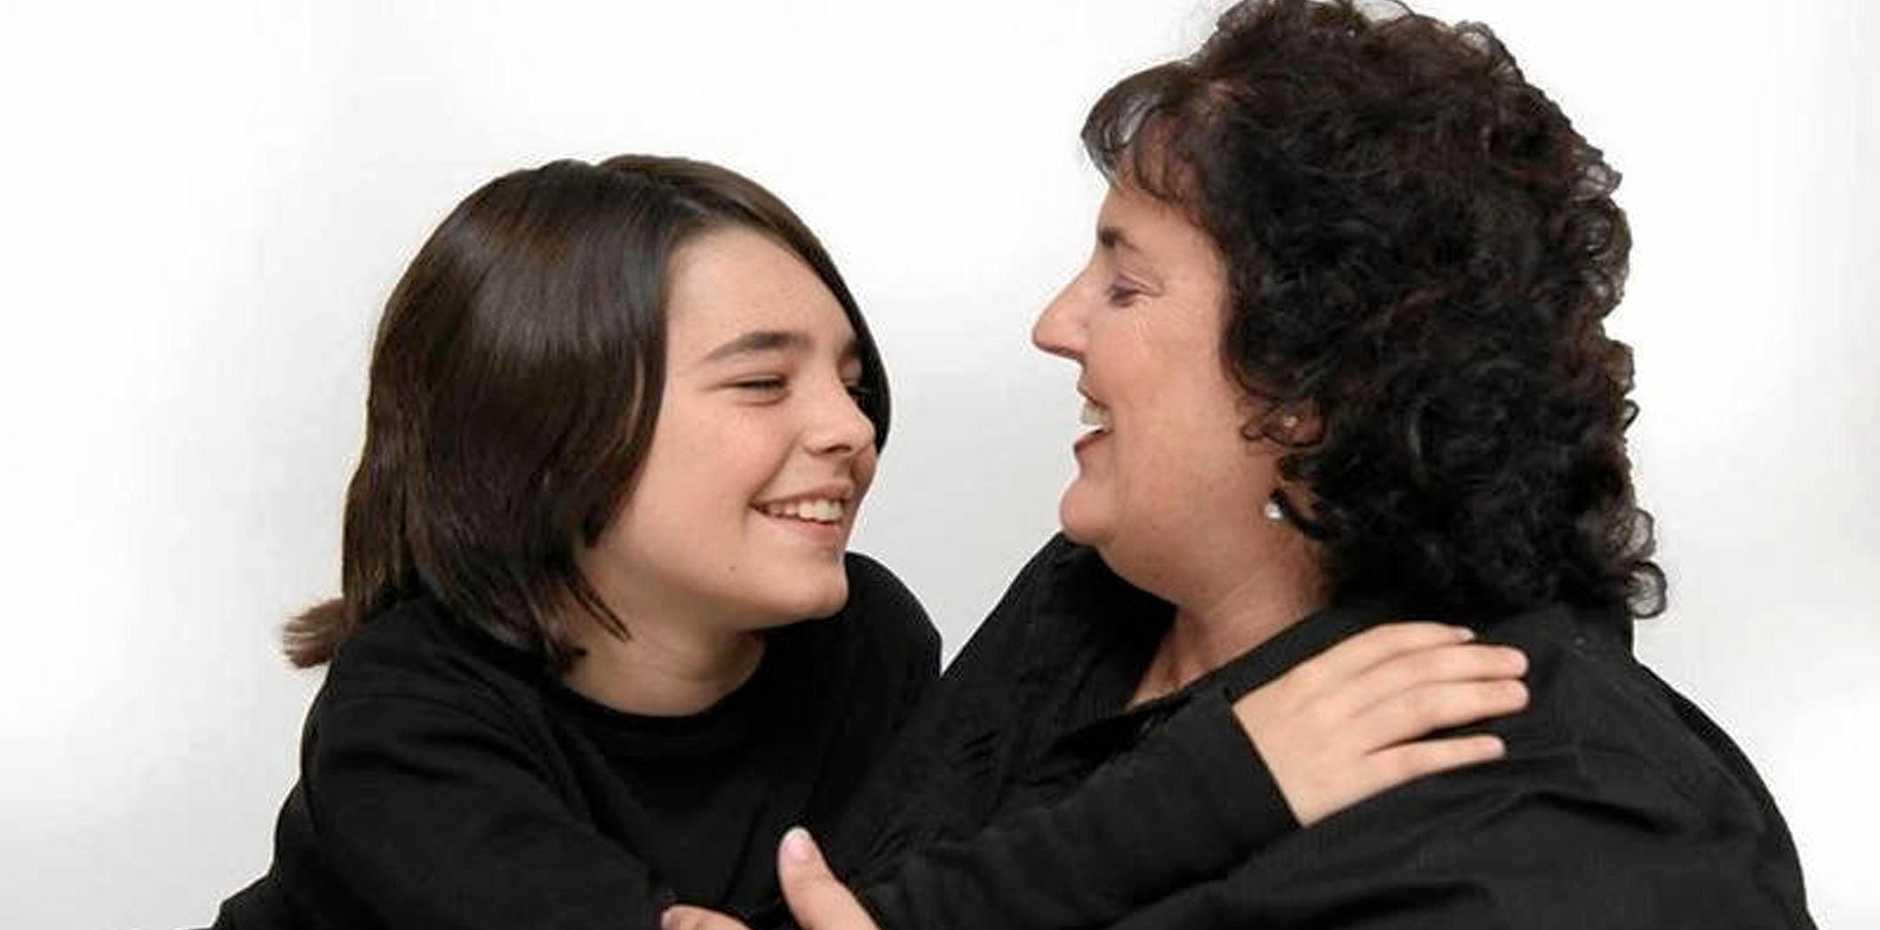 Lardeen 'Larnie' Glennon with her son Matthew 'Matty' Glennon before the tragic car crash on the Peak Downs Highway in 2011.